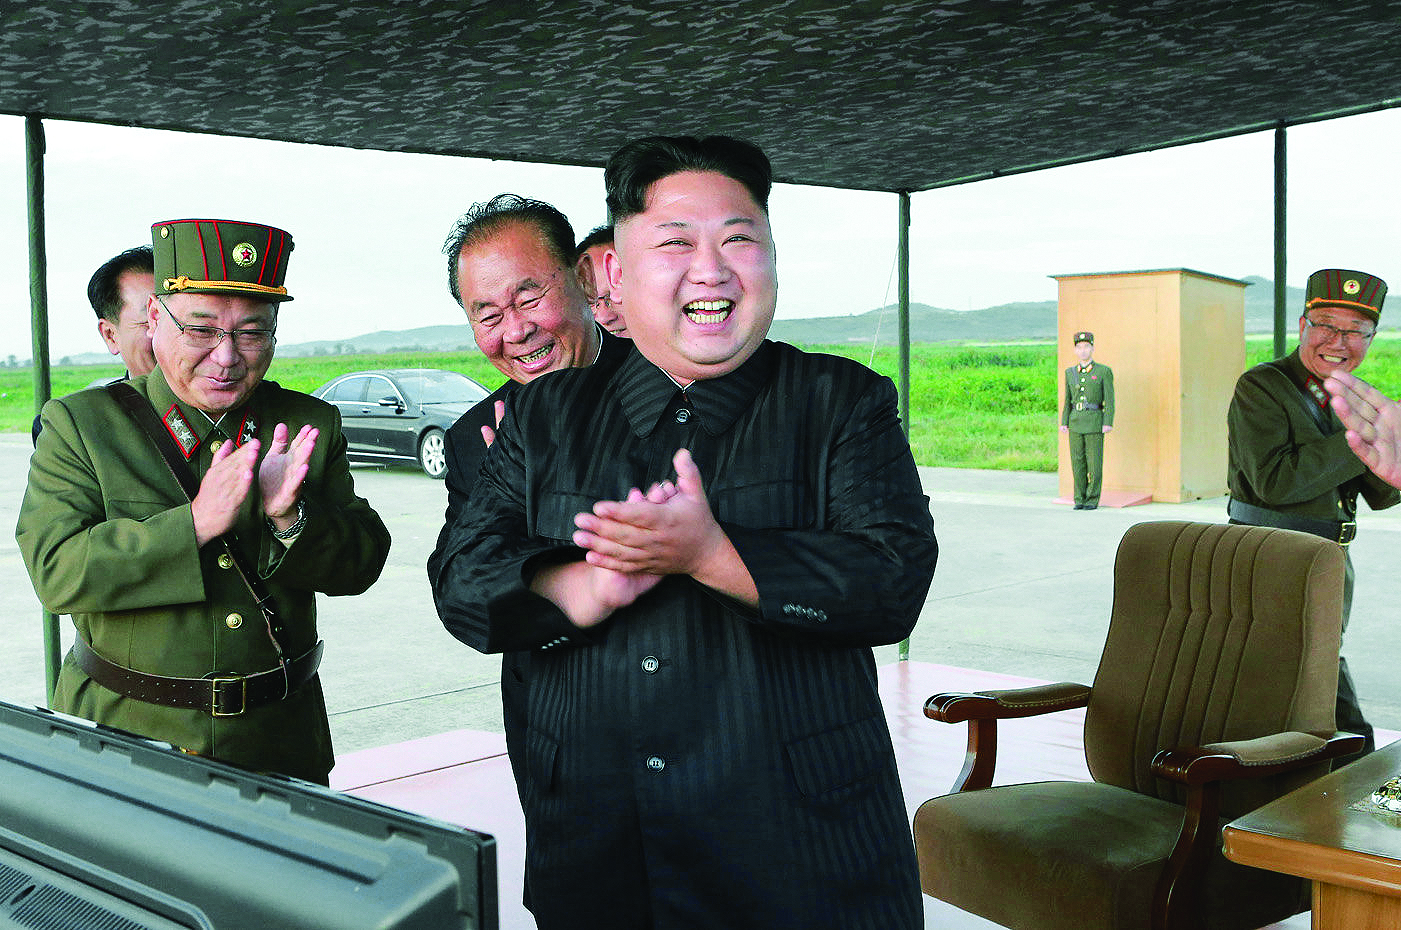 North Korea seeking military 'equilibrium' with U.S.